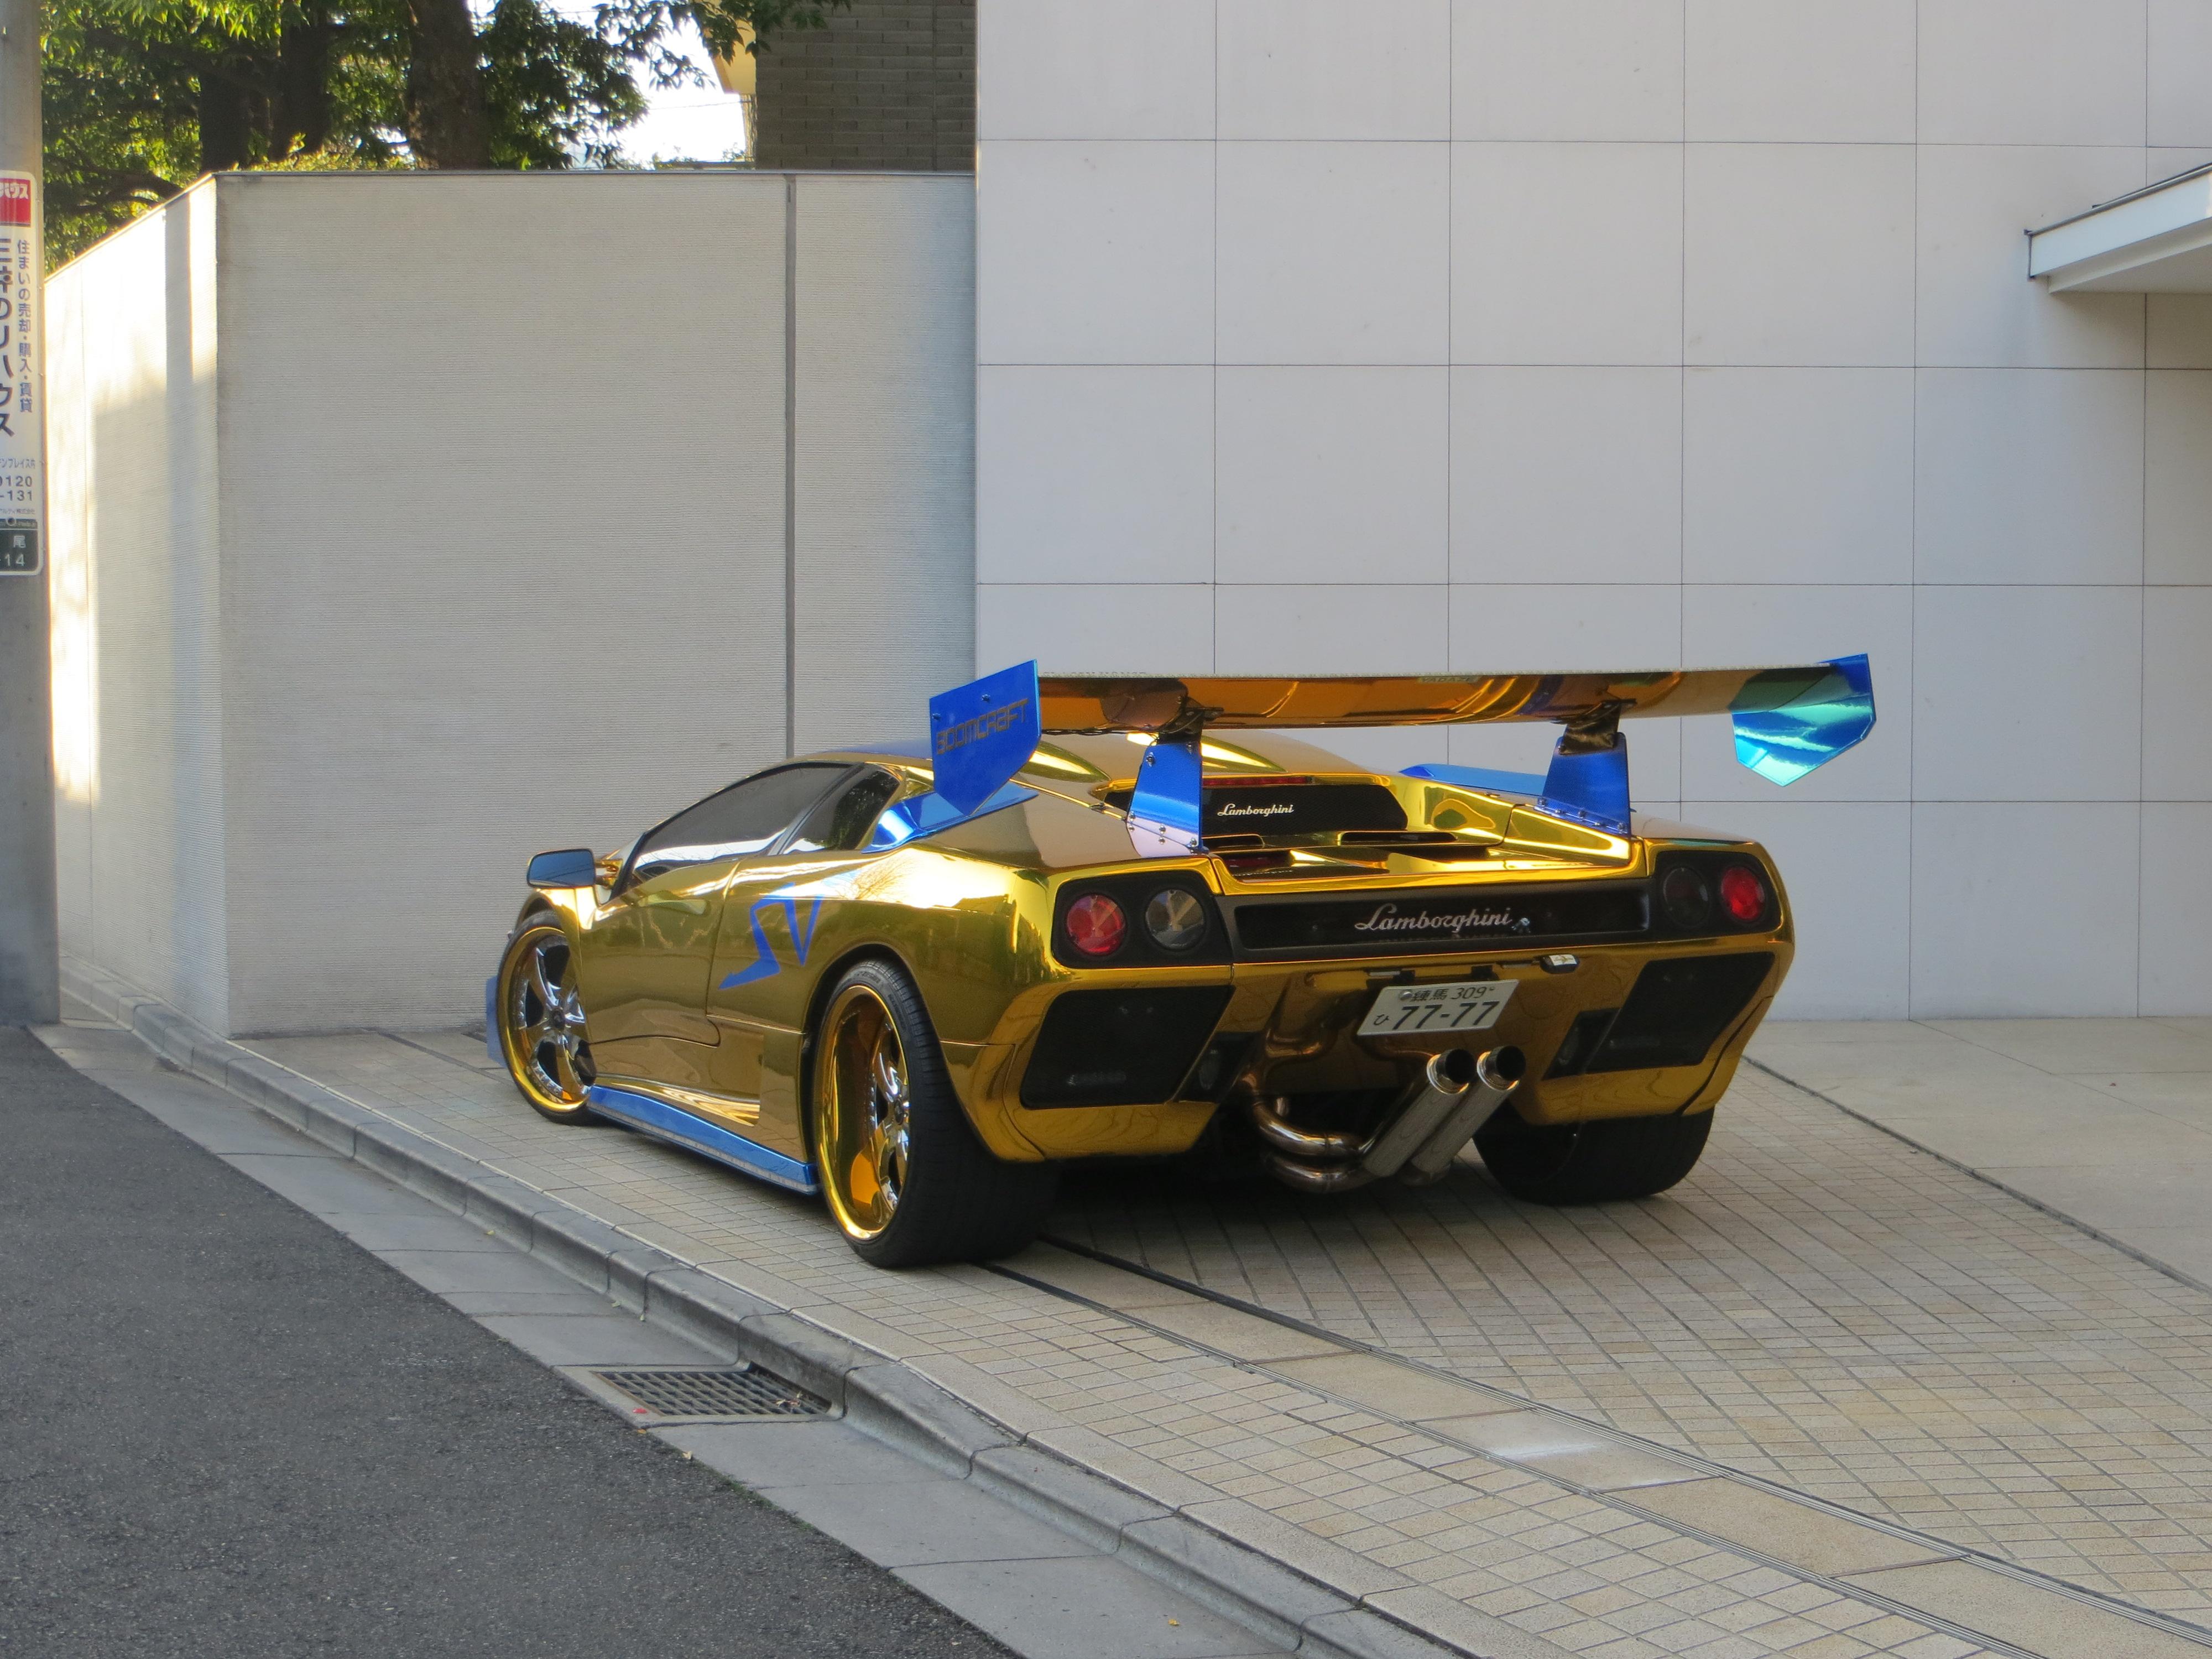 Sick Lamborghini Diablo Sv Is Saw In Tokyo